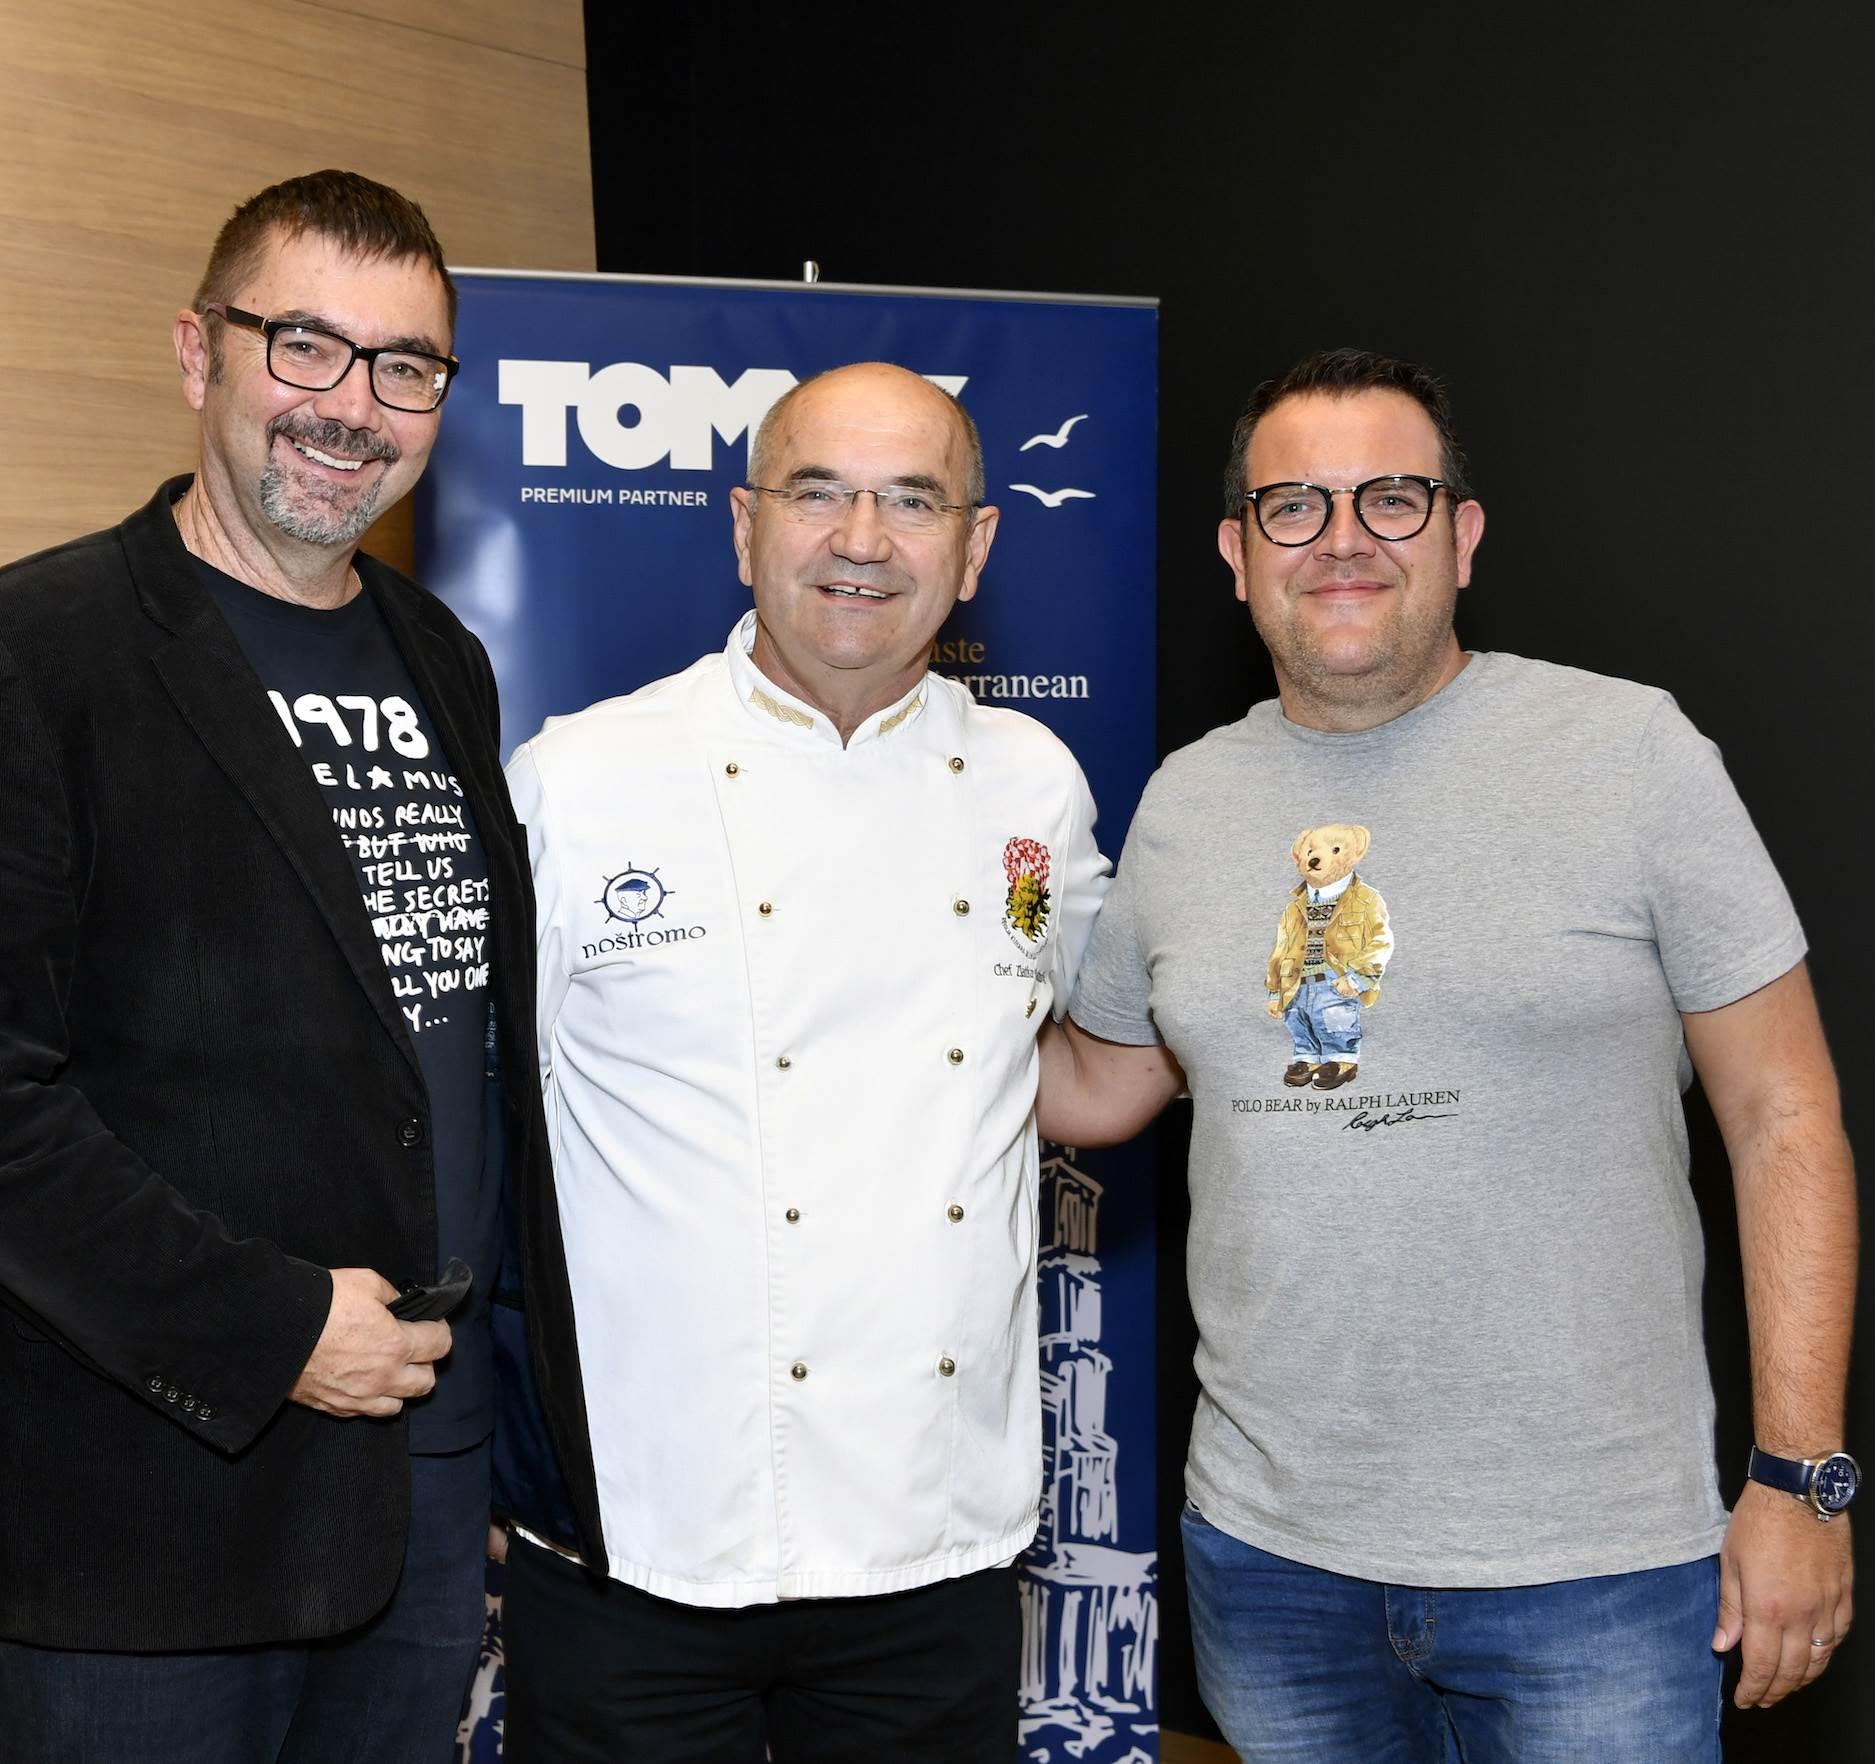 Siniša Koceić, sommelier i chefovi Zlatko Marinović Noštromo i Dane Tahirović